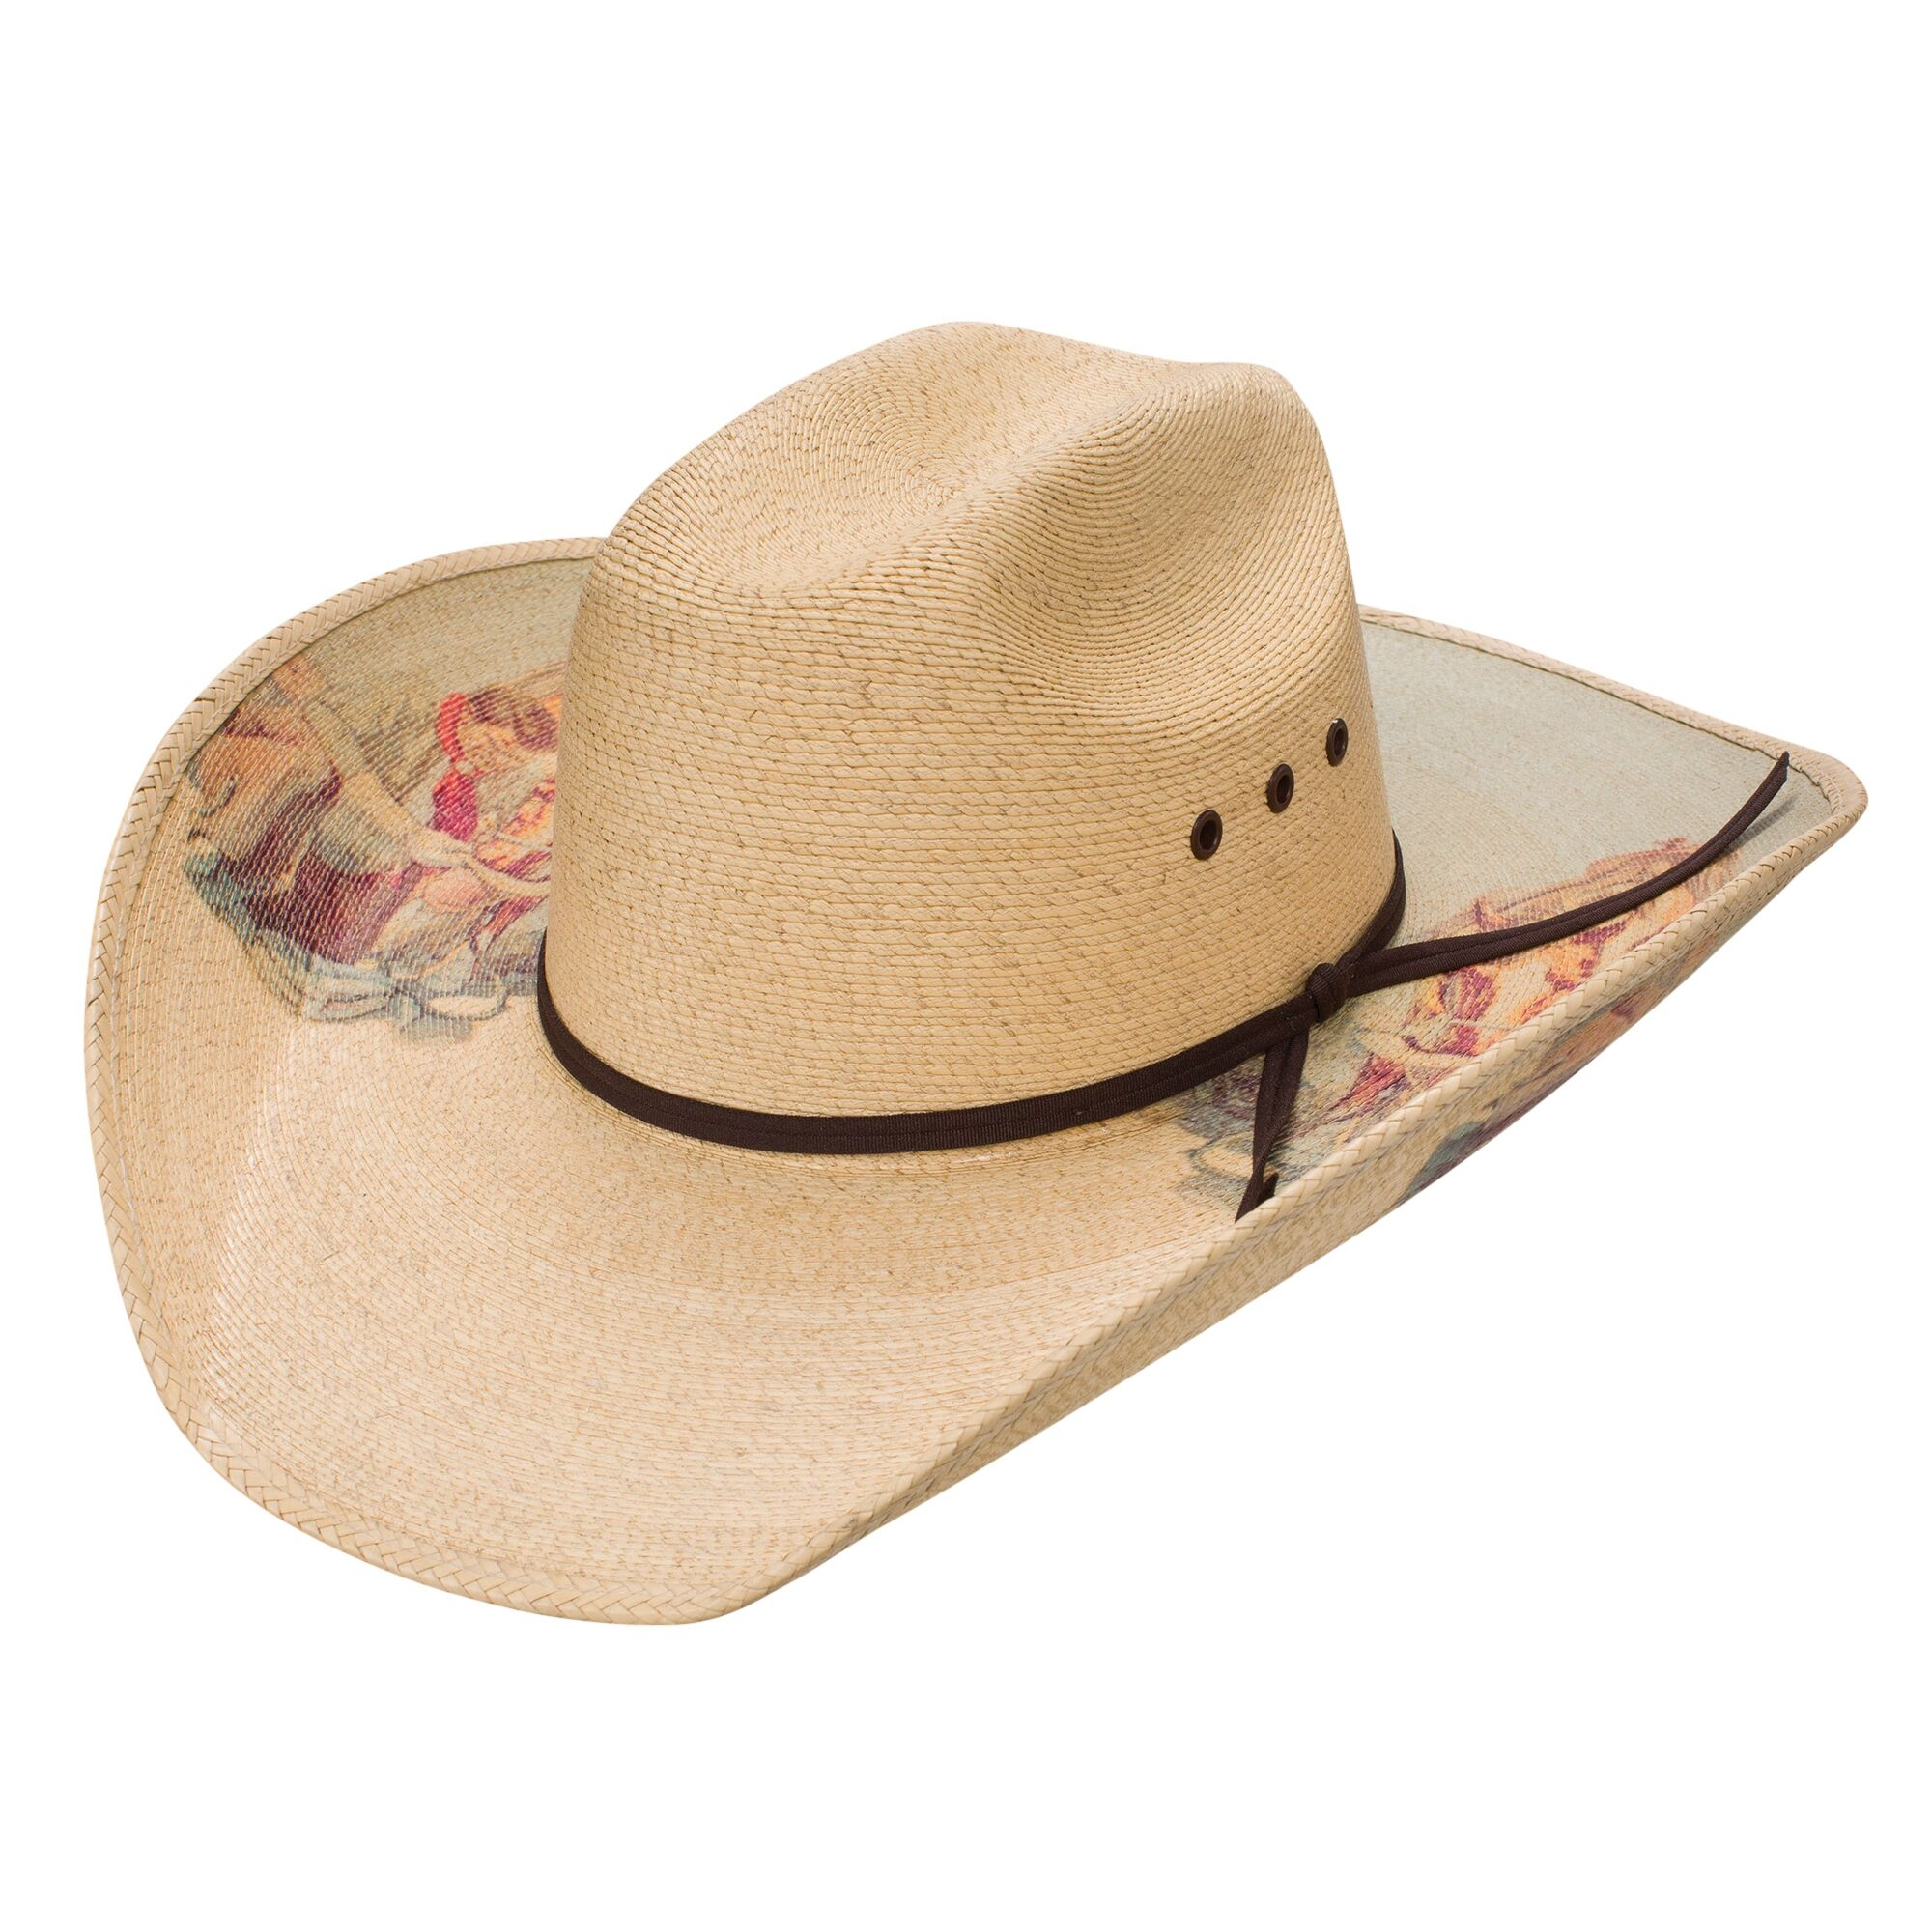 Stetson Last Drop - Childrens Straw Cowboy Hat